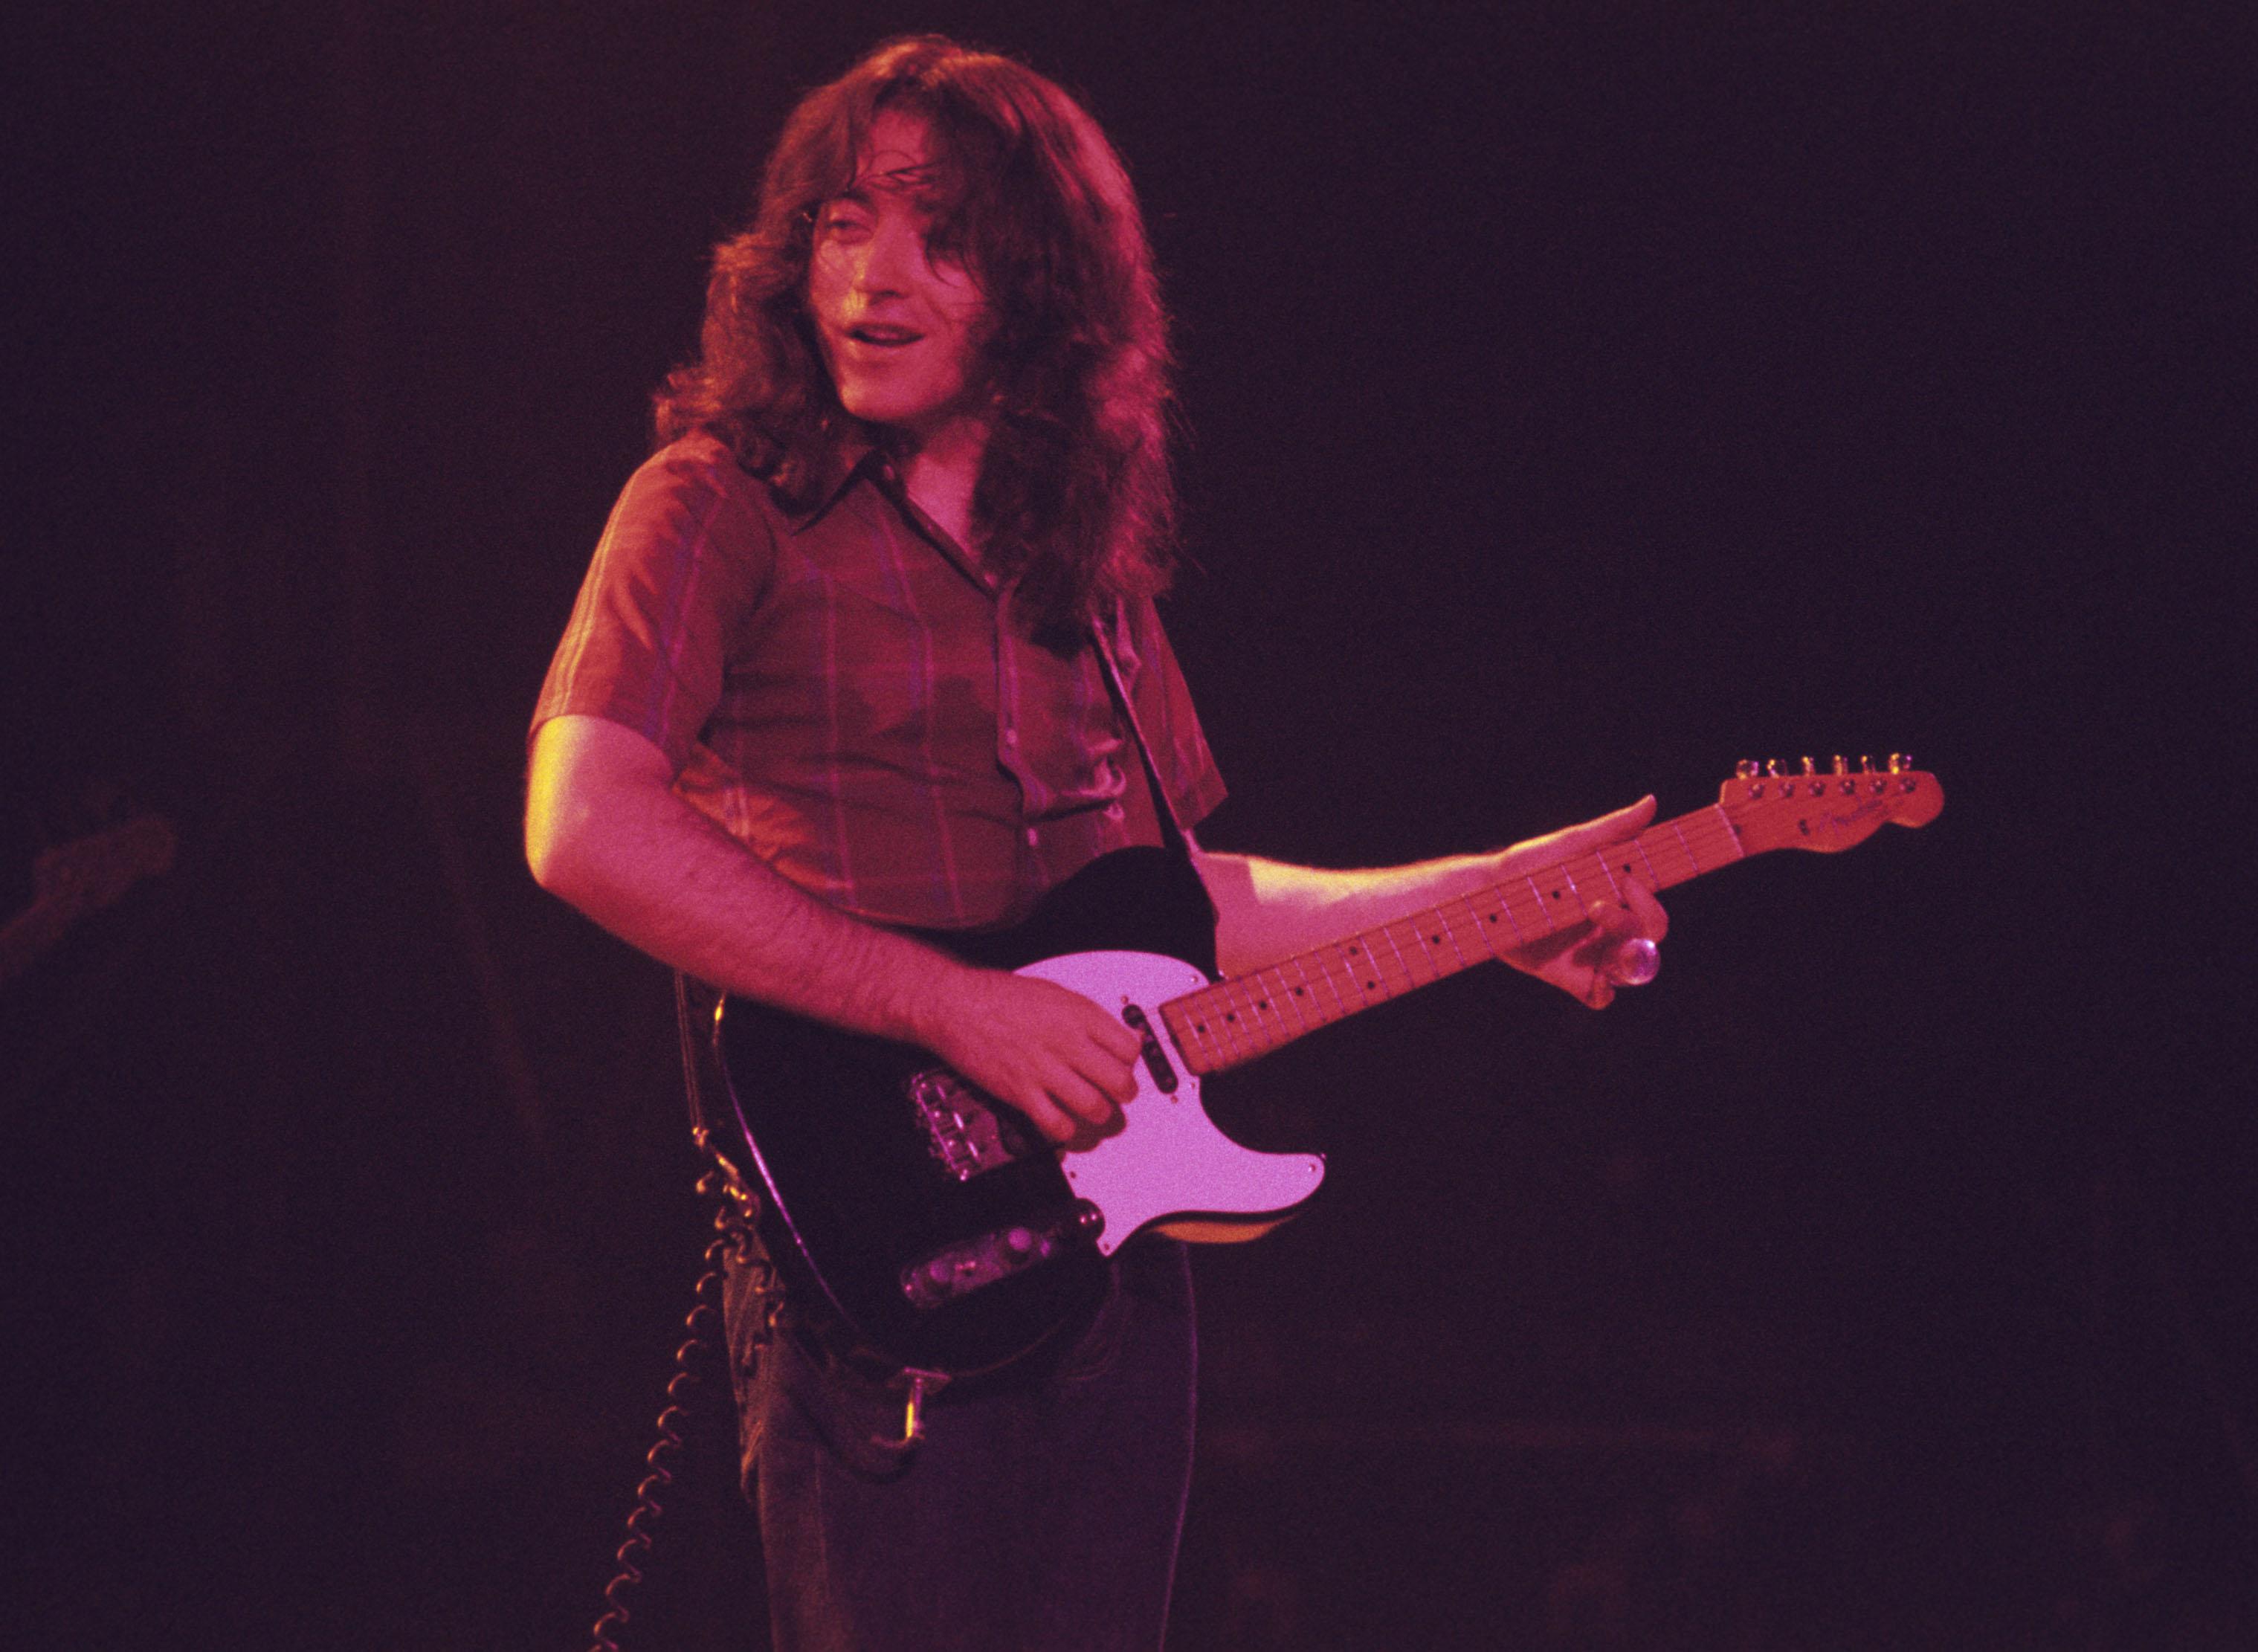 ATLANTA, GA - February 8: Irish blues guitarist Rory Gallagher performs at the Omni Coliseum on February 8, 1976 in Atlanta,